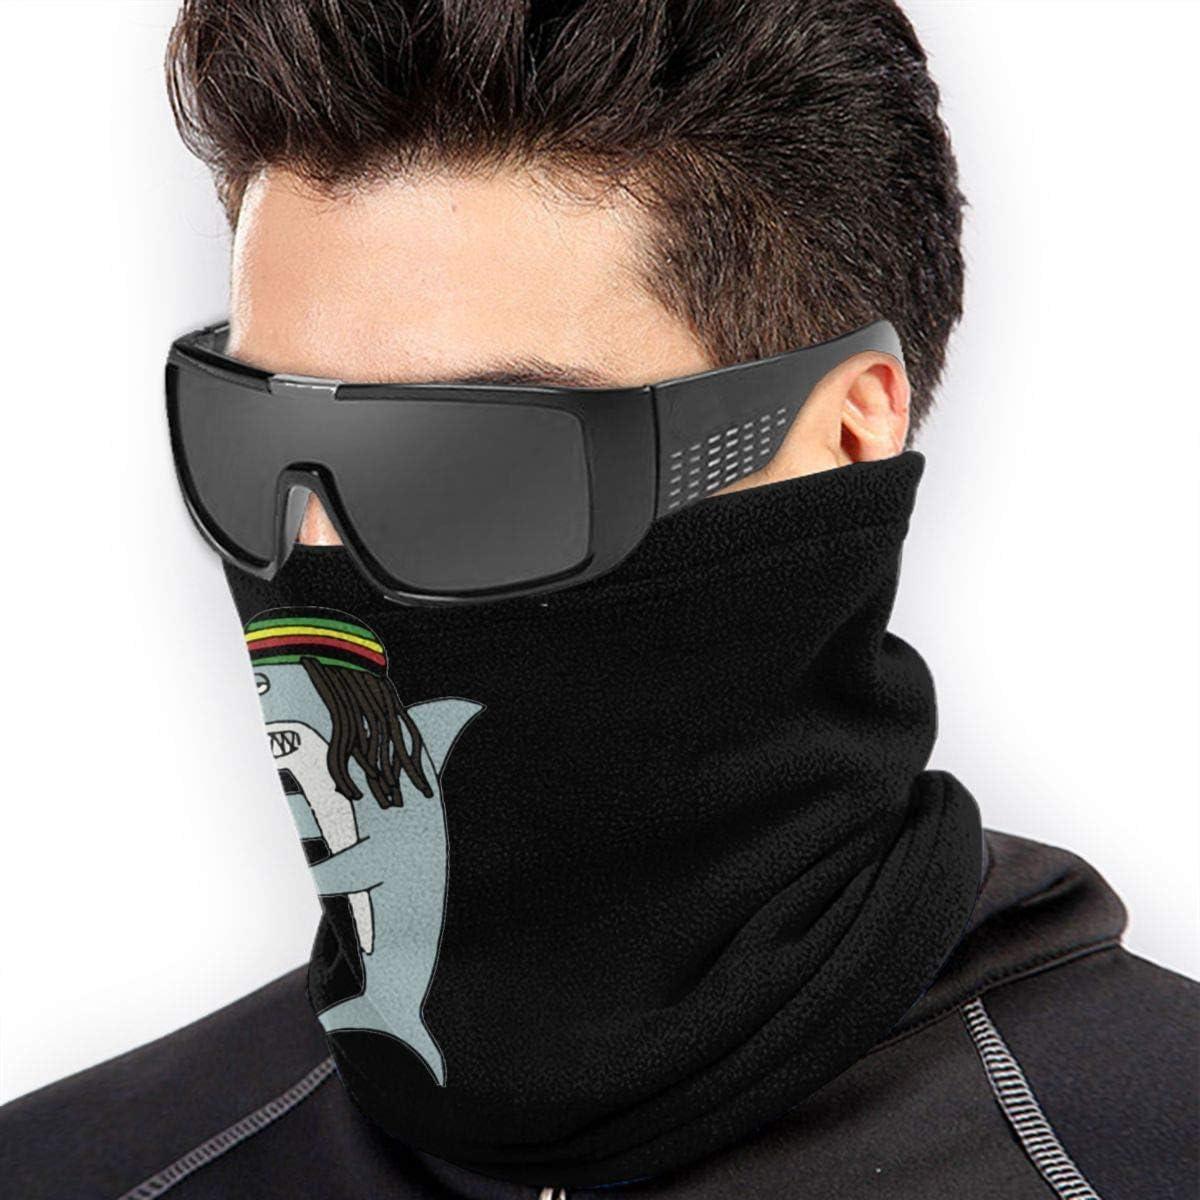 JKHHW Reggae Shark Fashion Warm Ski Cache-Cou en Microfibre